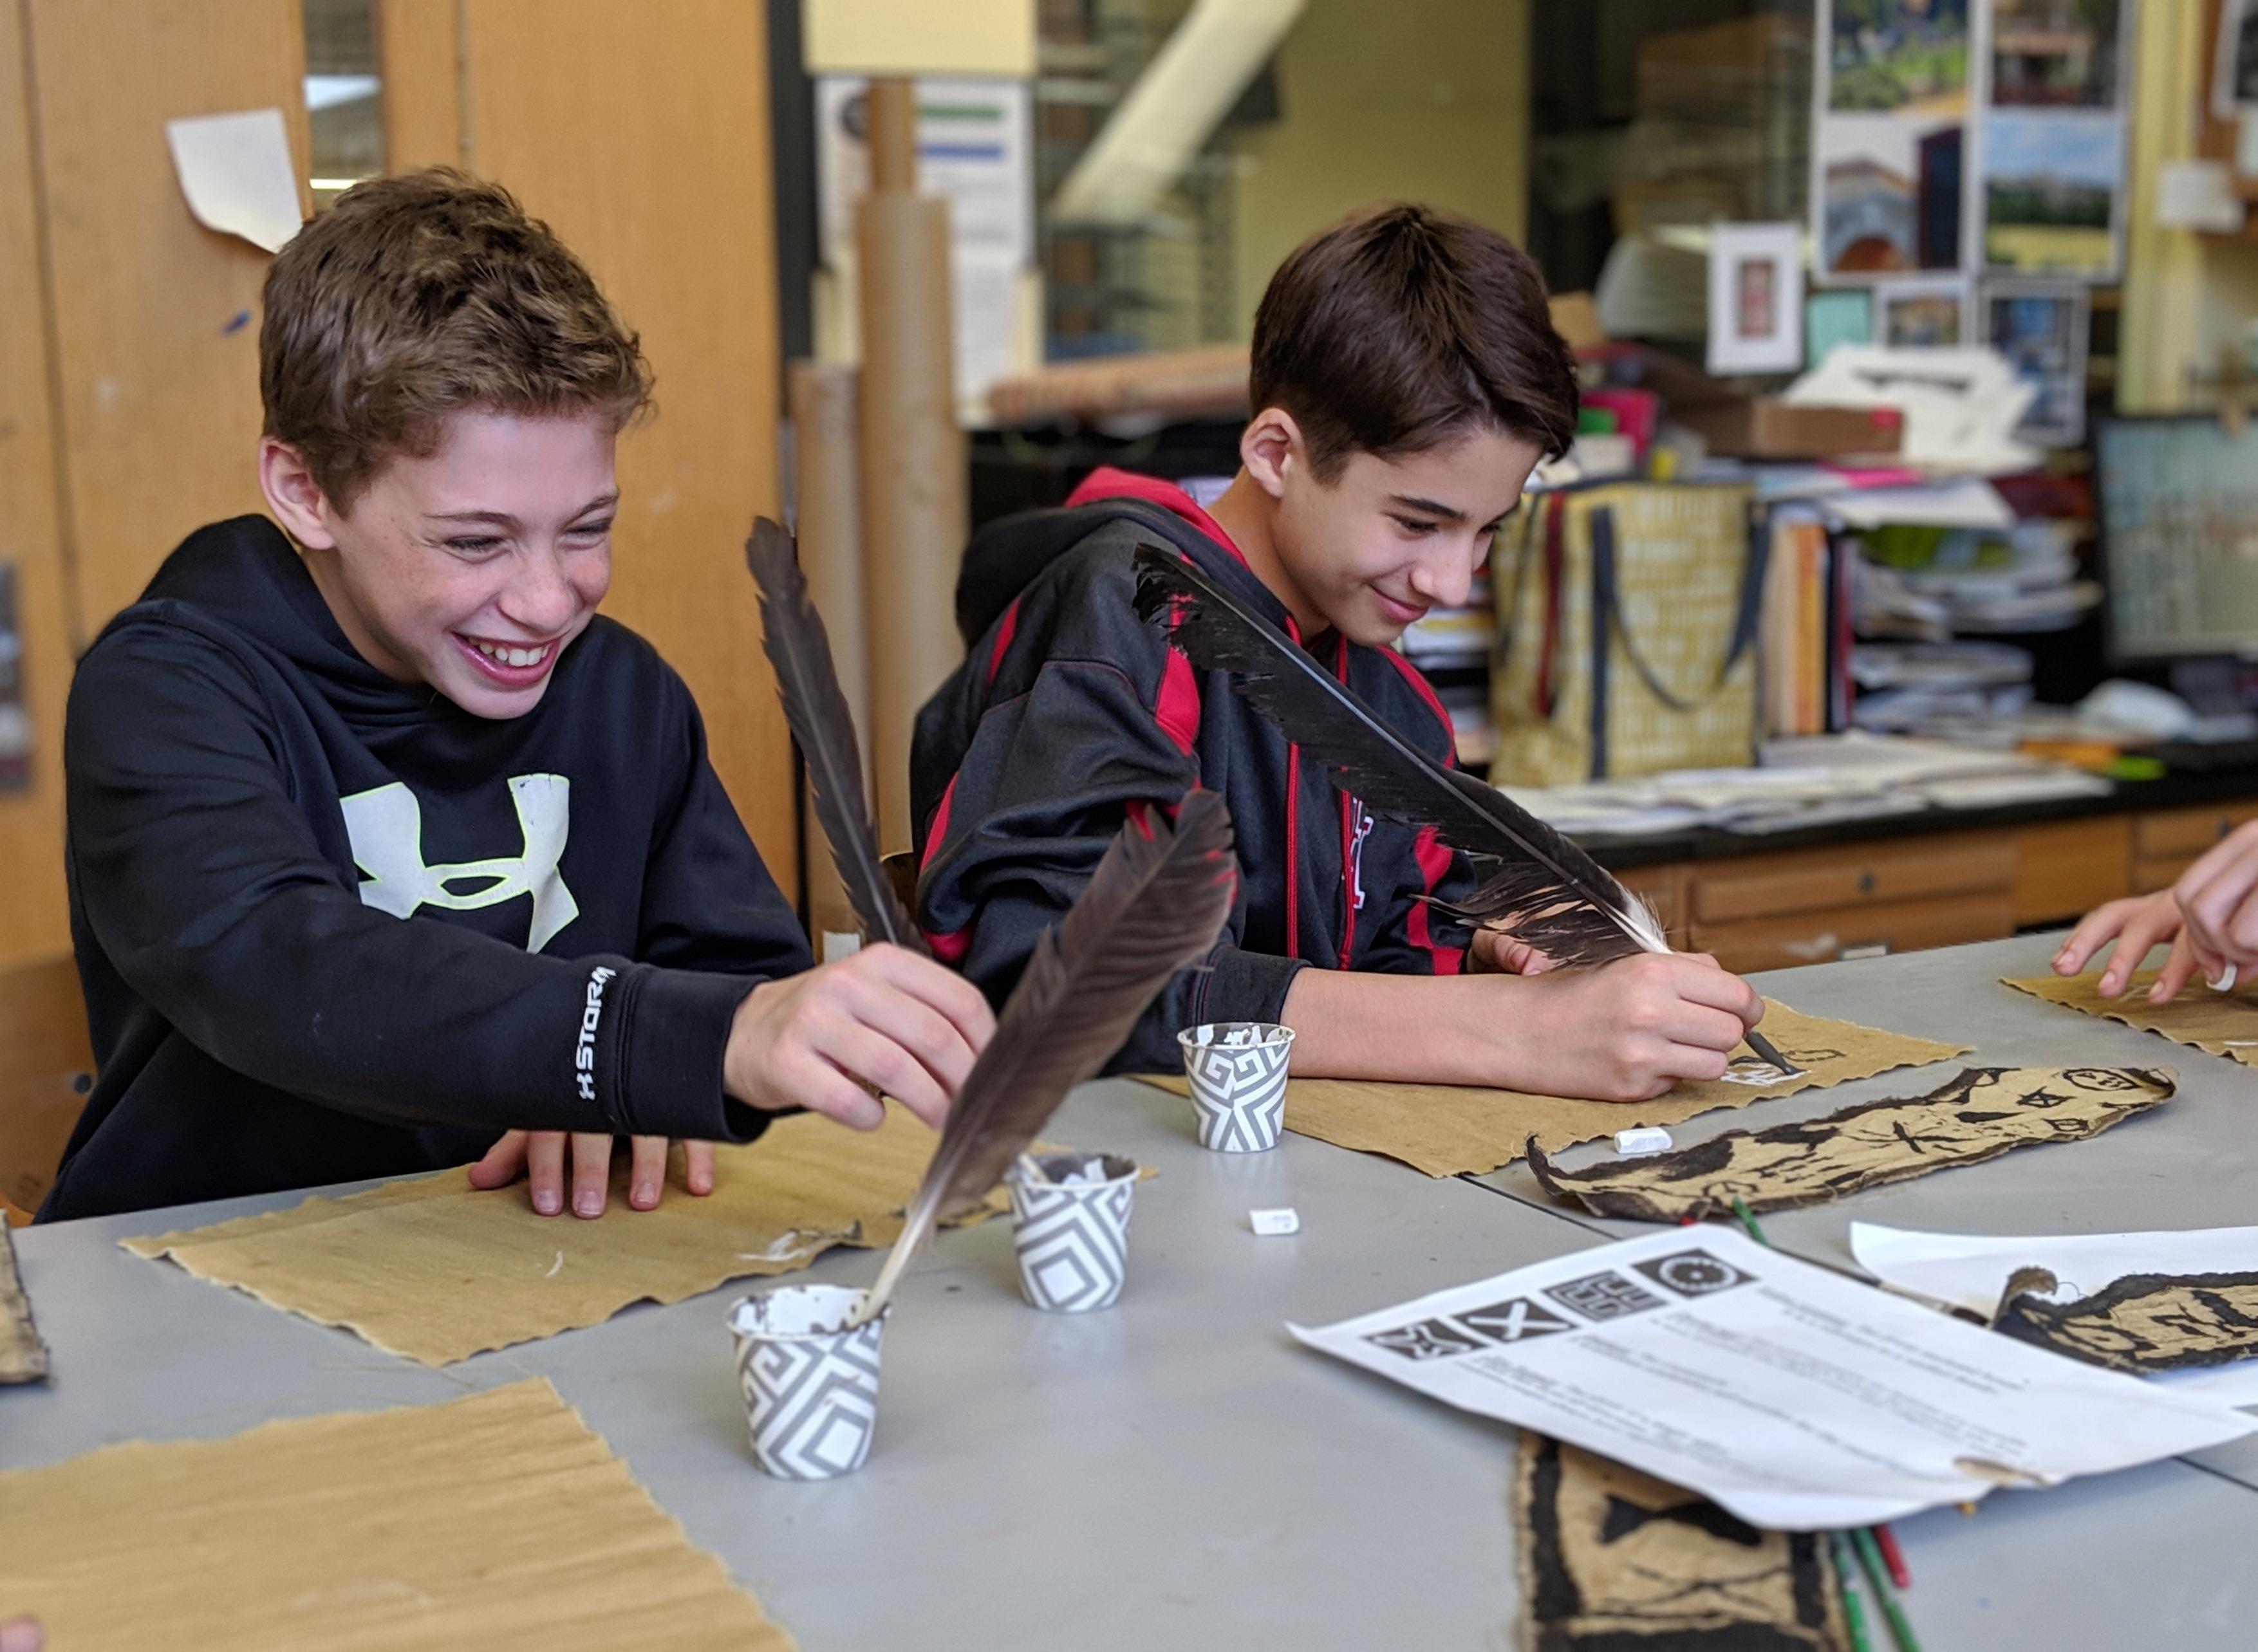 middle-school-arts-week-boys-laughing-2